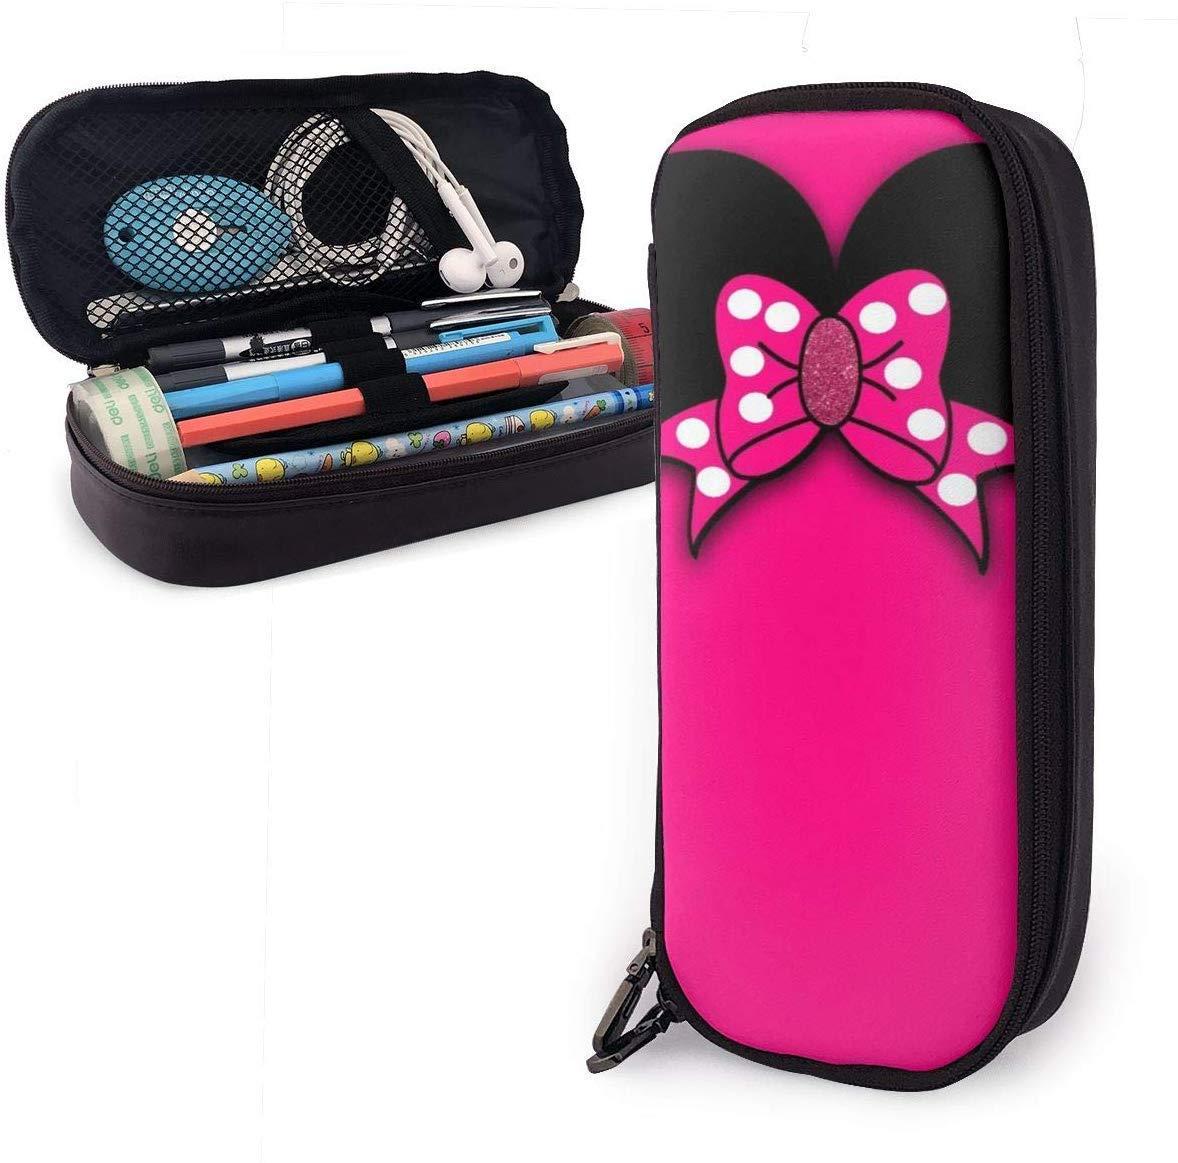 Estuche para lápices Minnie Bowknot Bolso para lápices de gran capacidad Maquillaje Estuche para bolígrafos Papelería con doble cremallera Portalápices para escuela/oficina: Amazon.es: Oficina y papelería